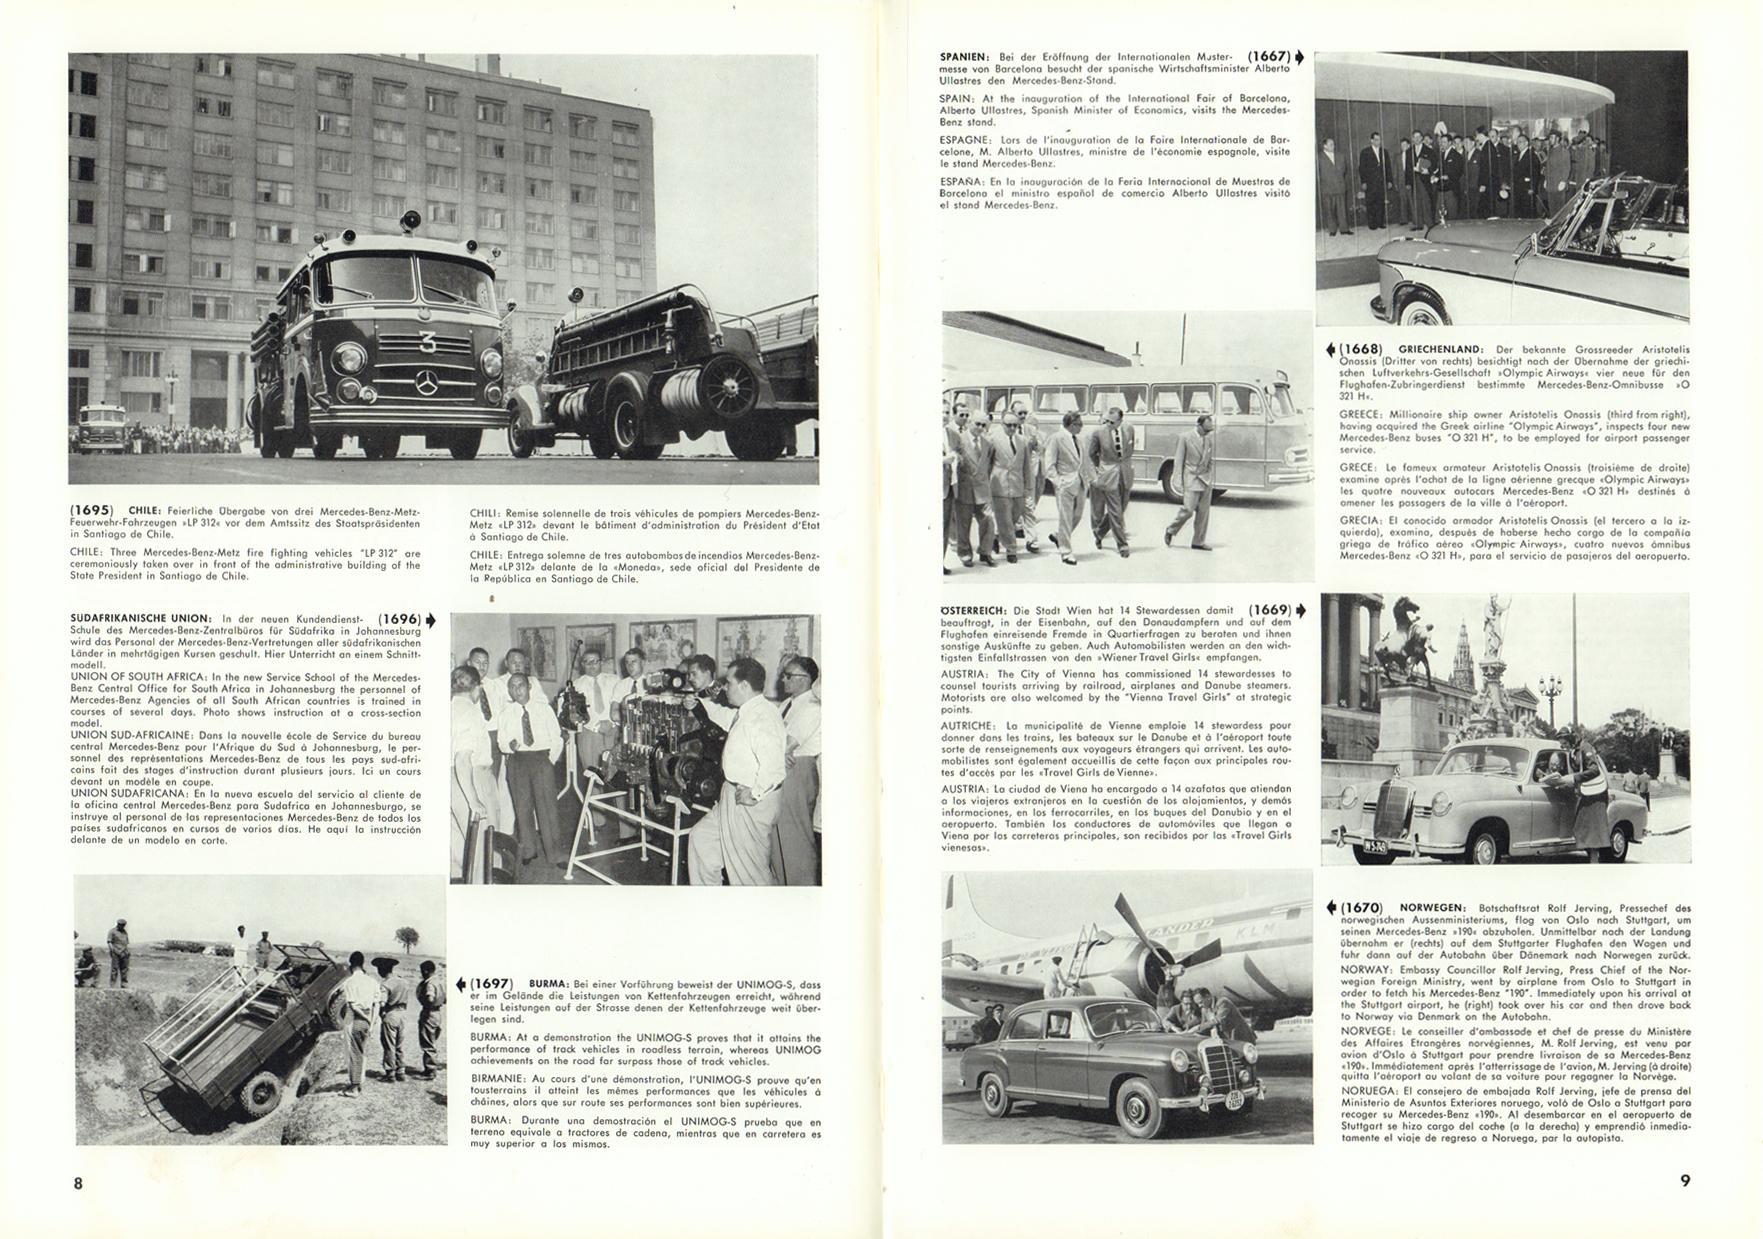 (REVISTA): Periódico In aller welt n.º 12 - Mercedes-Benz no mundo - 1957 - multilingue 005